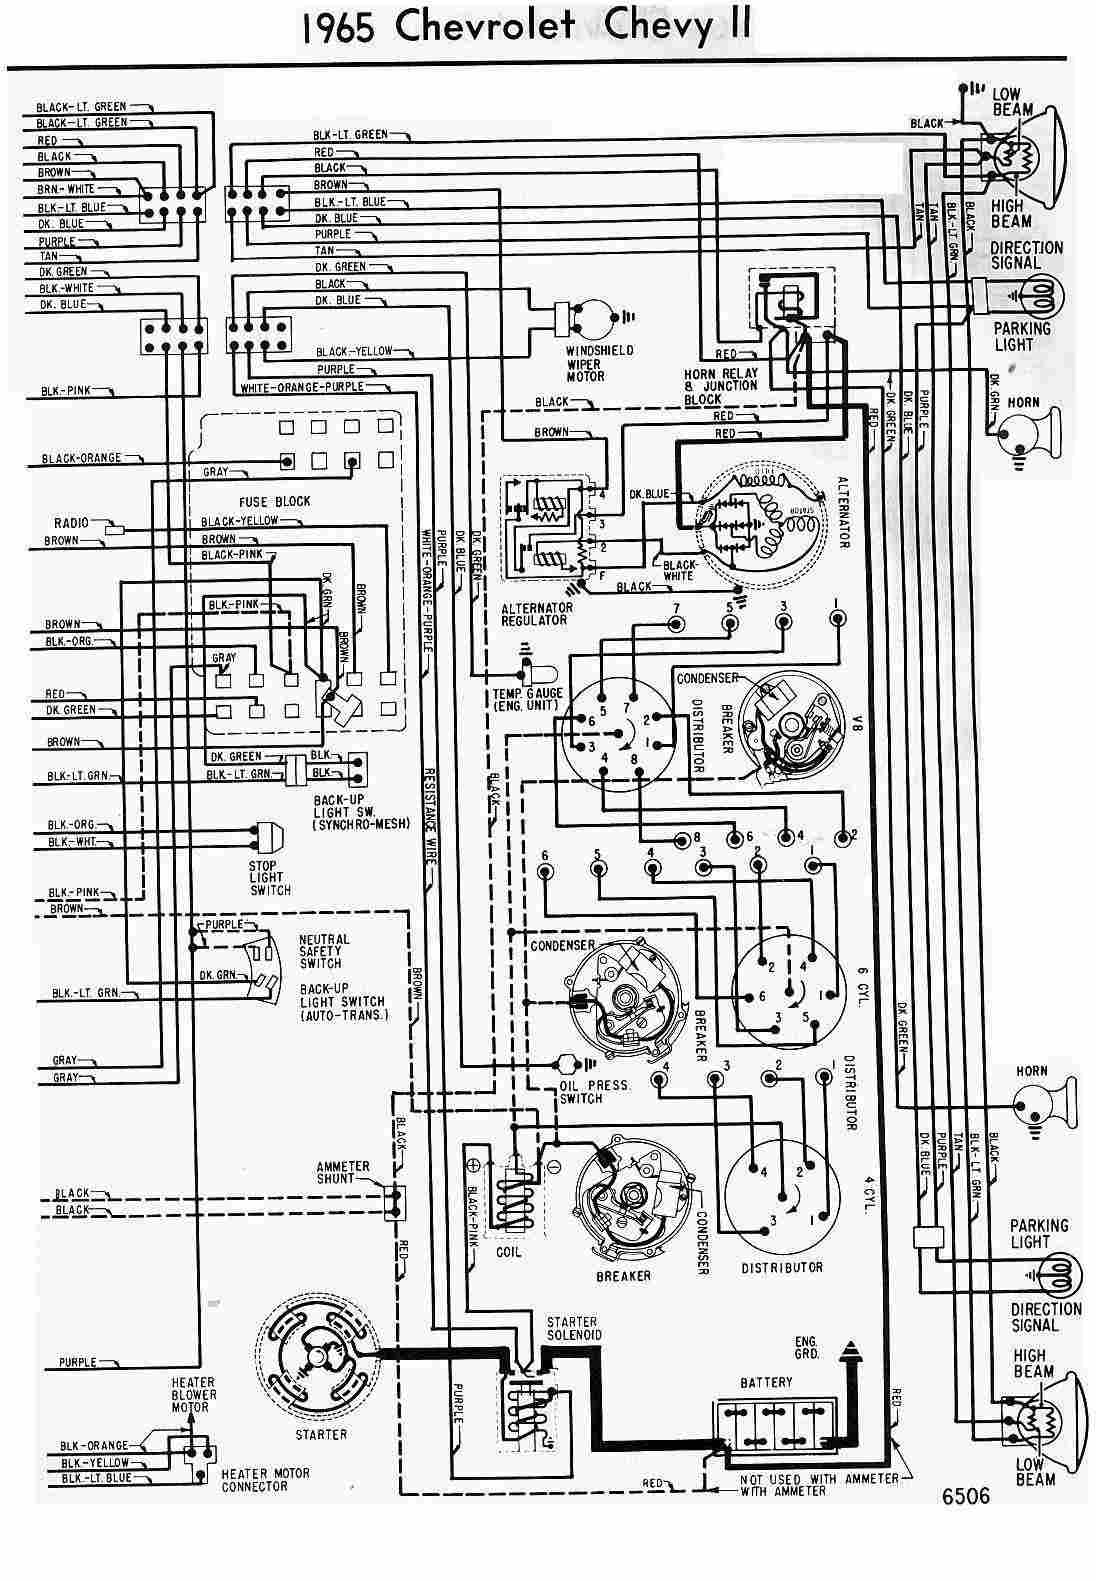 hight resolution of 66 impala ss wiring diagram wiring diagrams66 impala ss wiring diagram wiring library 1964 impala tail